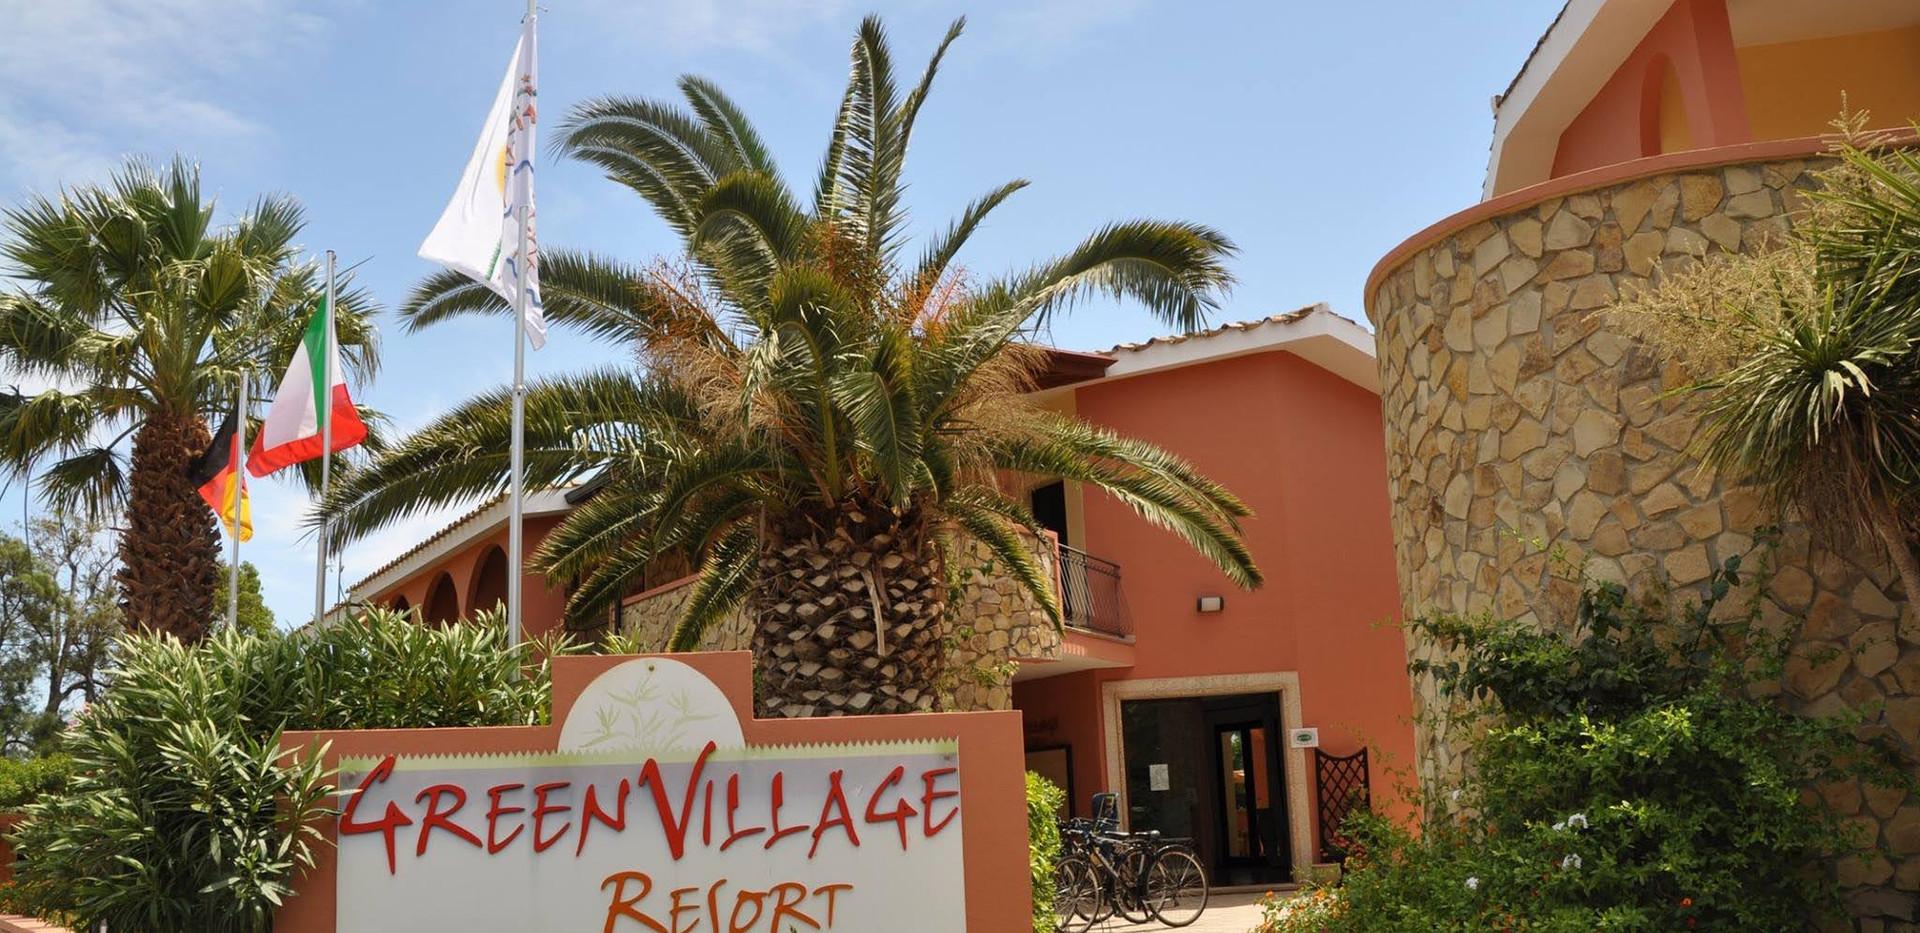 ingresso Green Village Resort.jpg